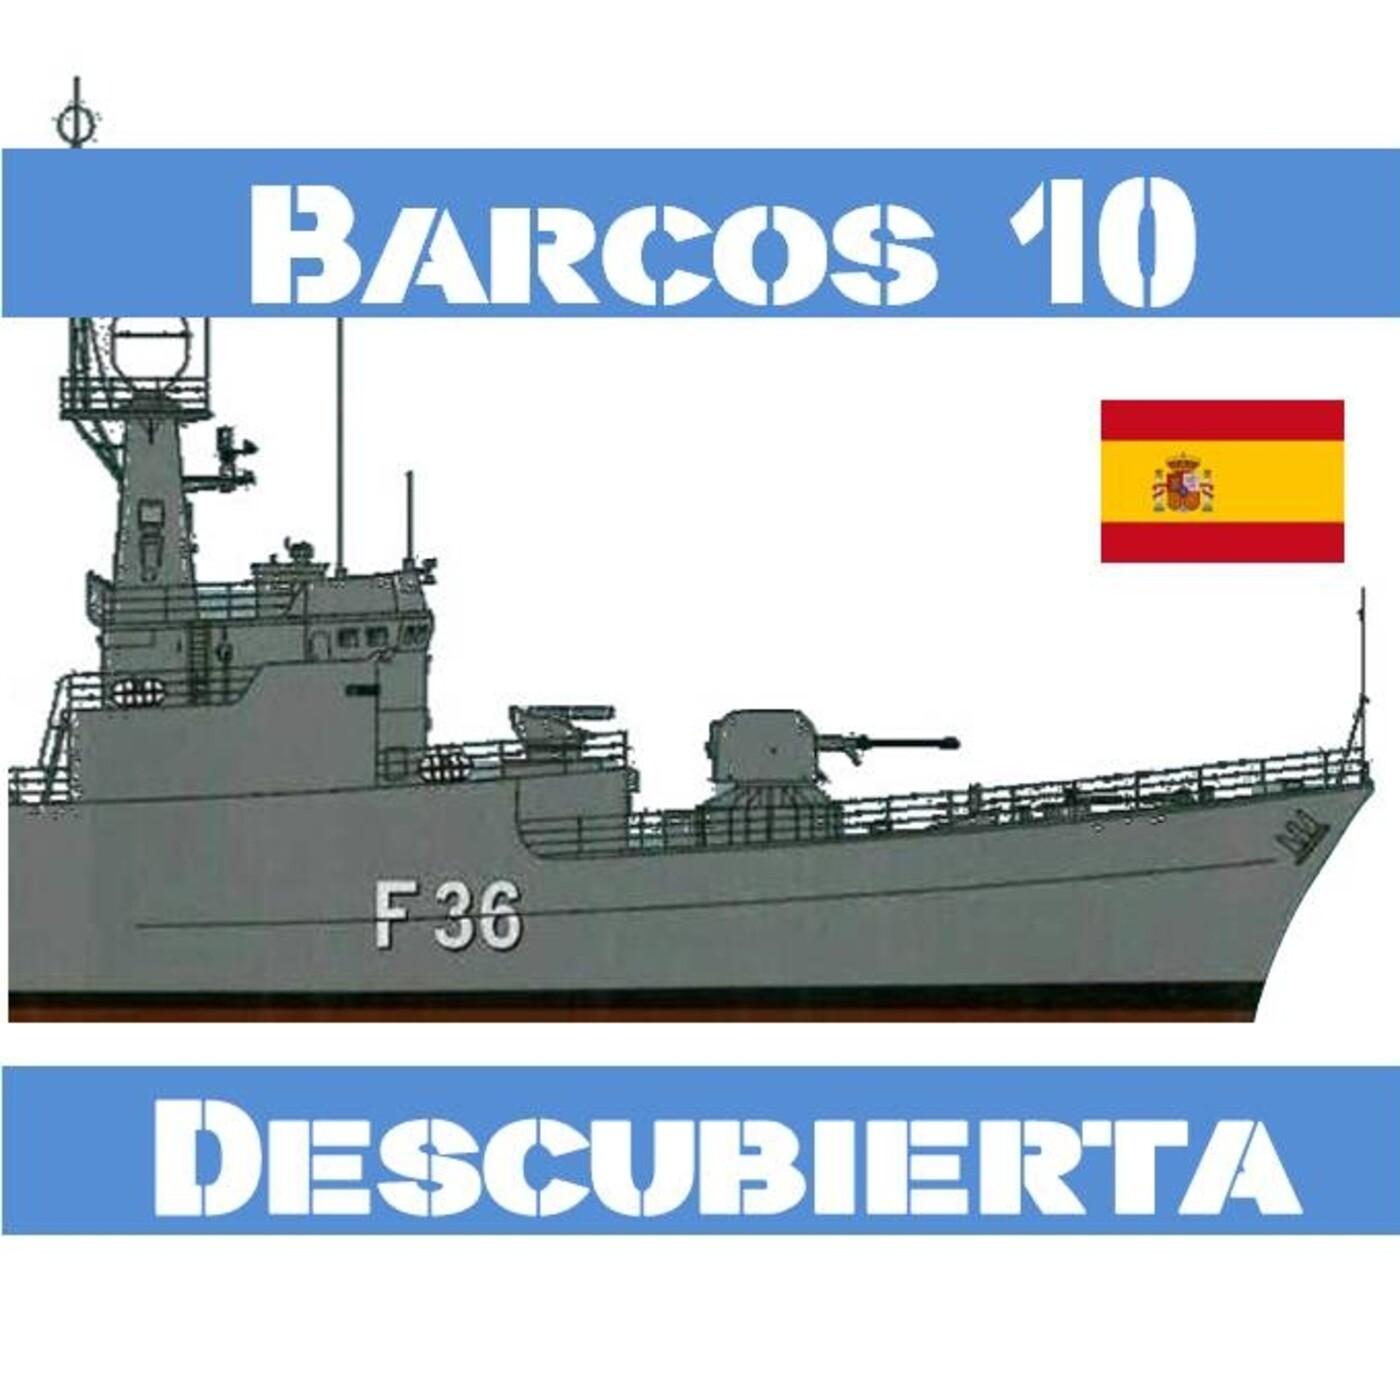 BARCOS 10 #47 Clase Descubierta, la hormiga atómica - Guerra Golfo 1991